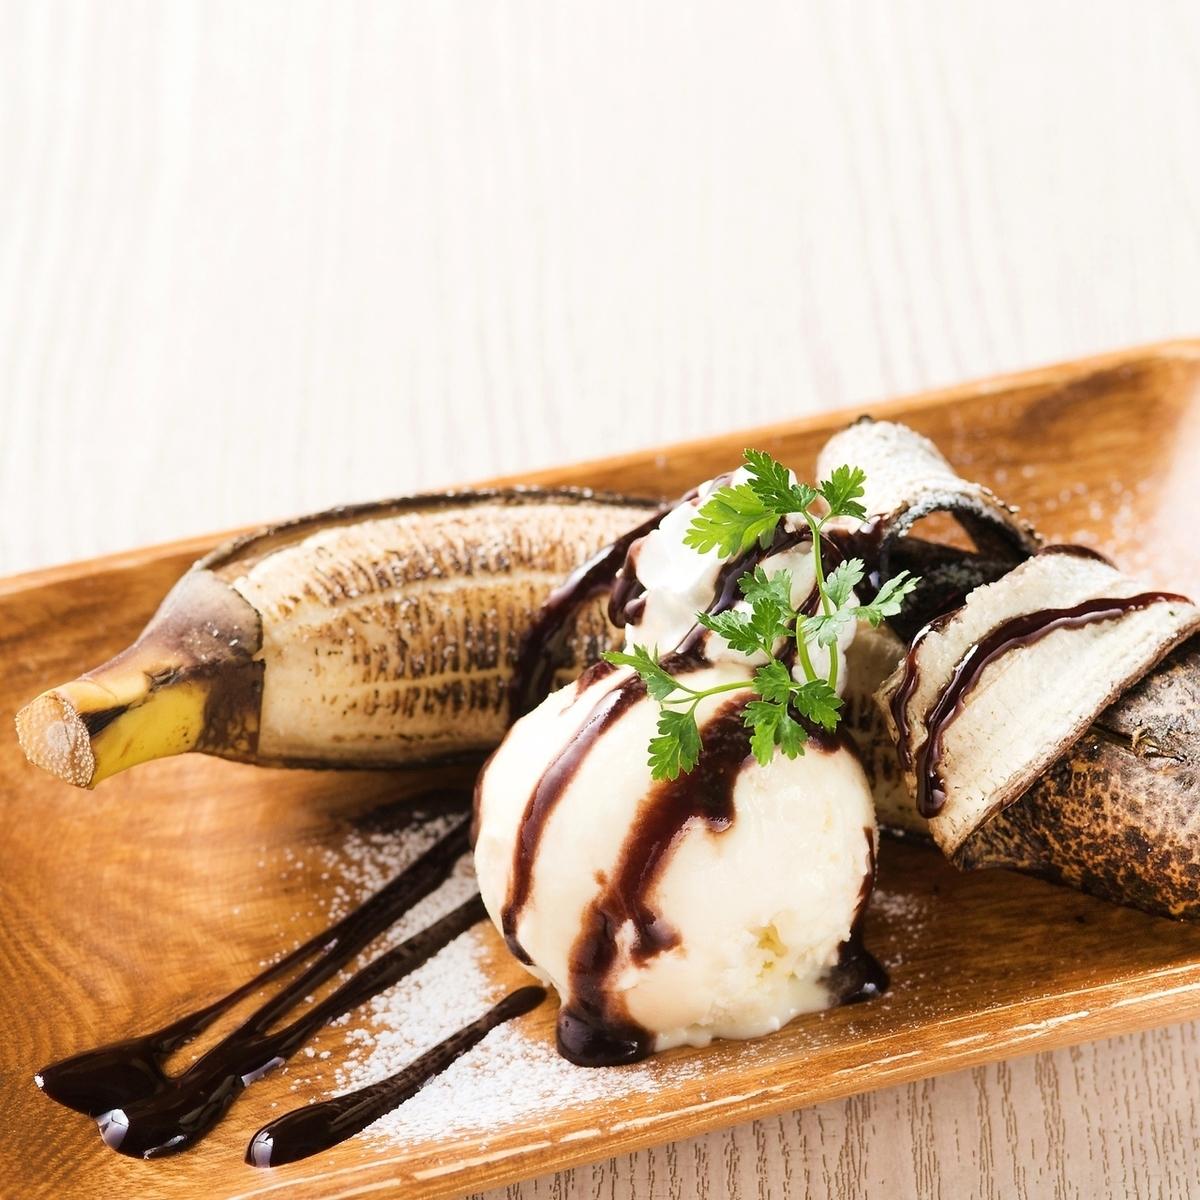 Baked banana with ice cream